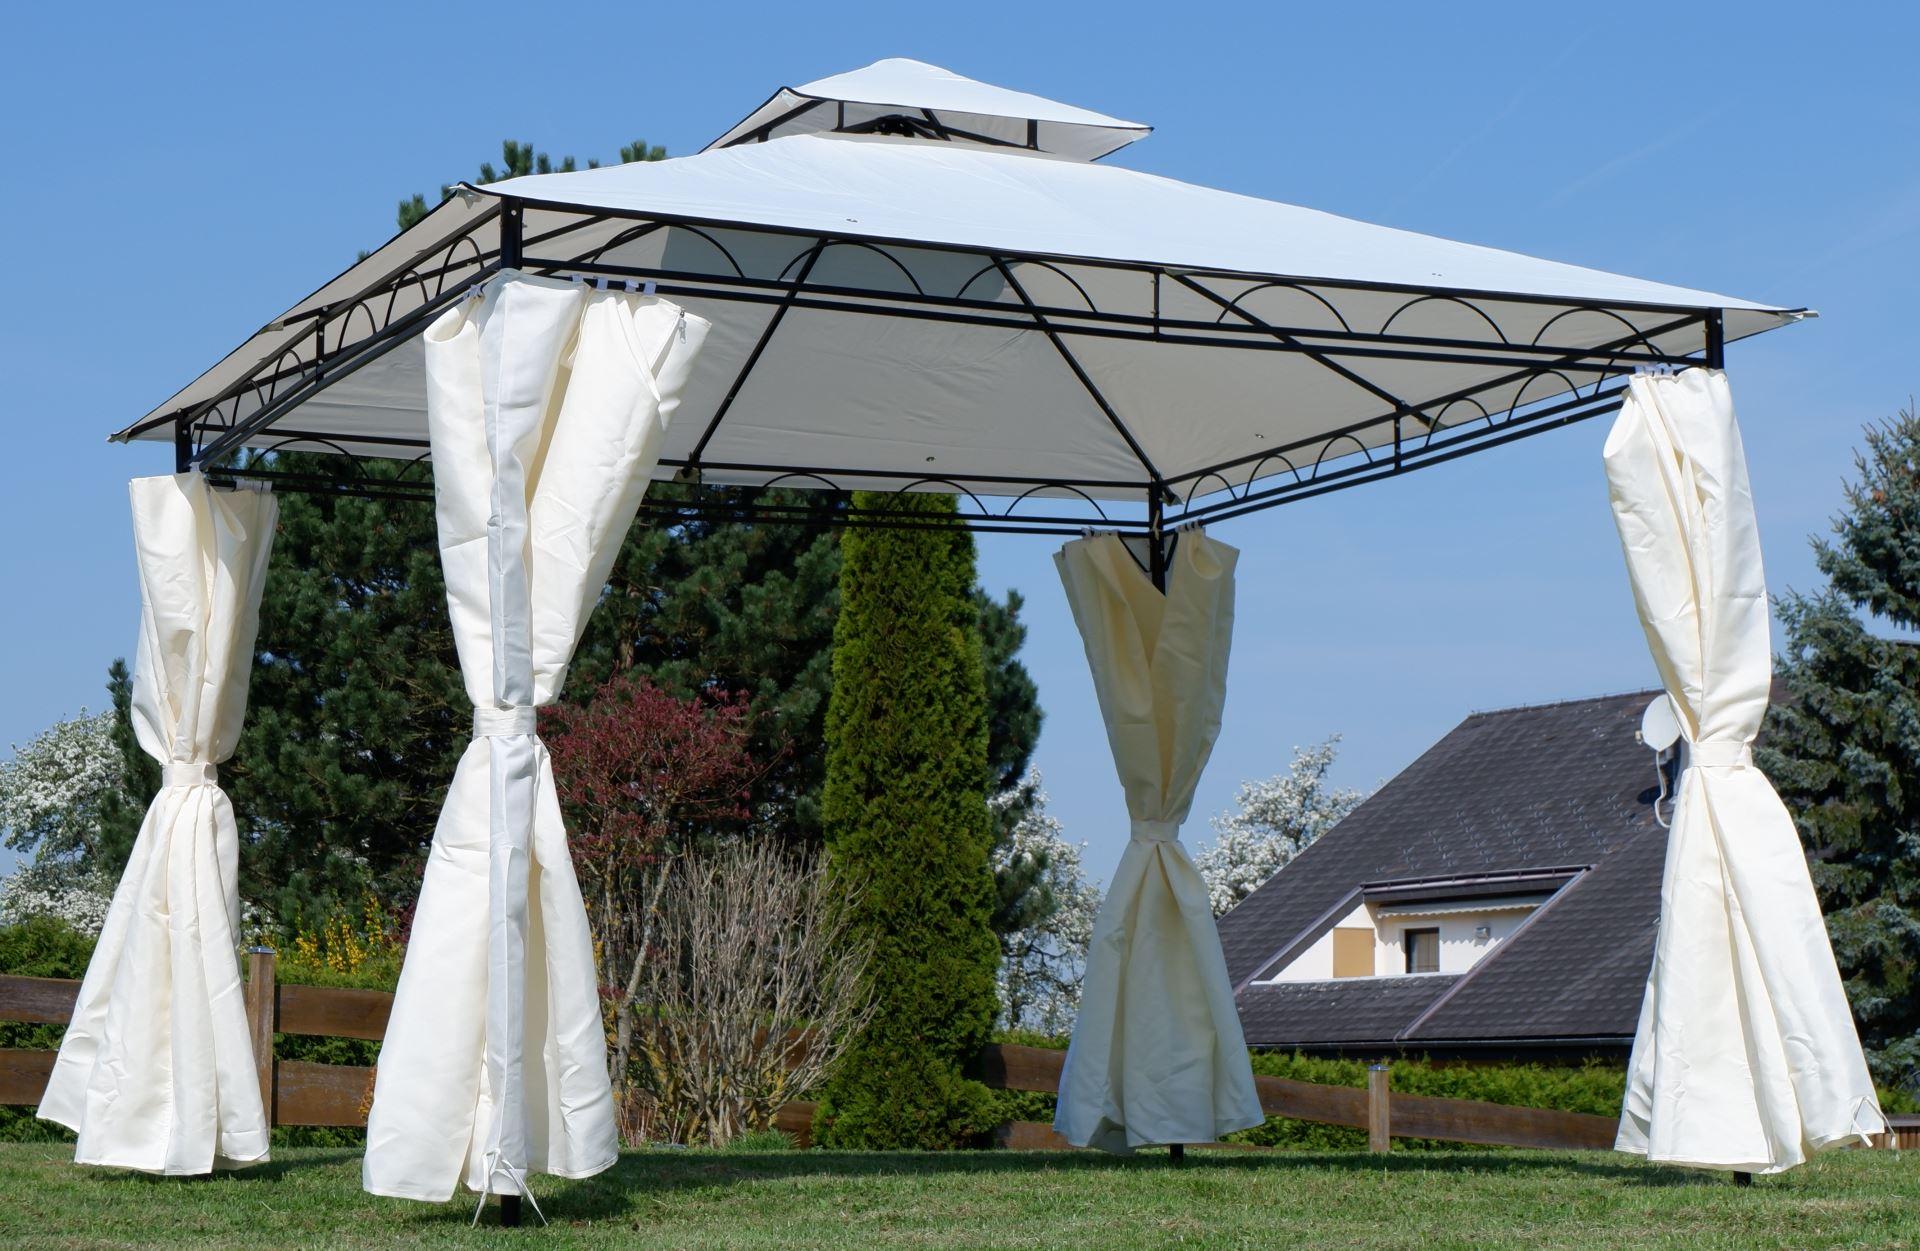 Top Eleganter Garten - Pavillon 3x3 Meter, Dach 100% WASSERDICHT UV30+ GO39